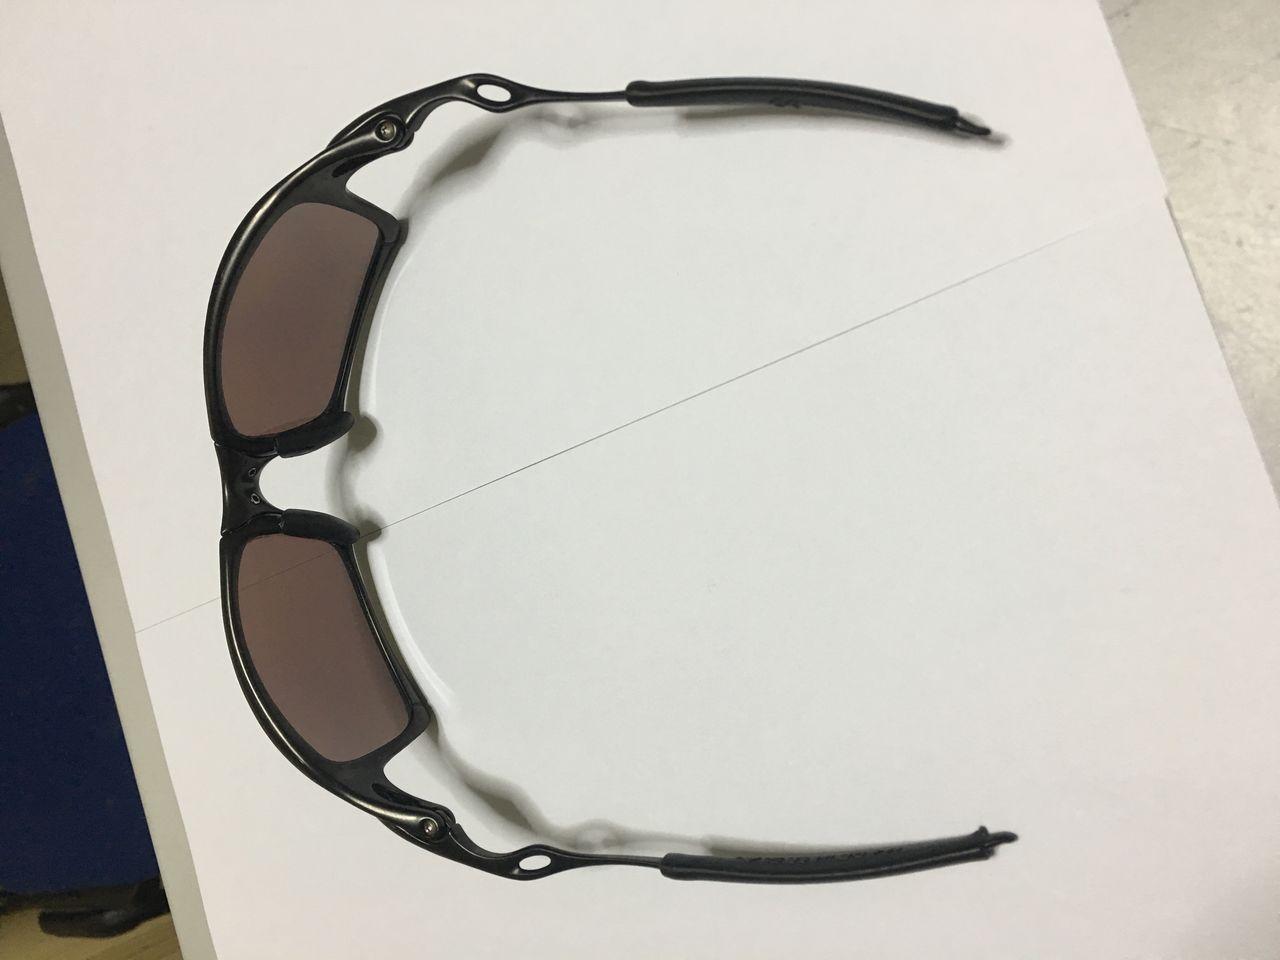 FS: Xsquared, Carbon frame OOBIP sku oo6011-08, Badman Plasma frame with Sapphire lenses - IMG_1378.jpg